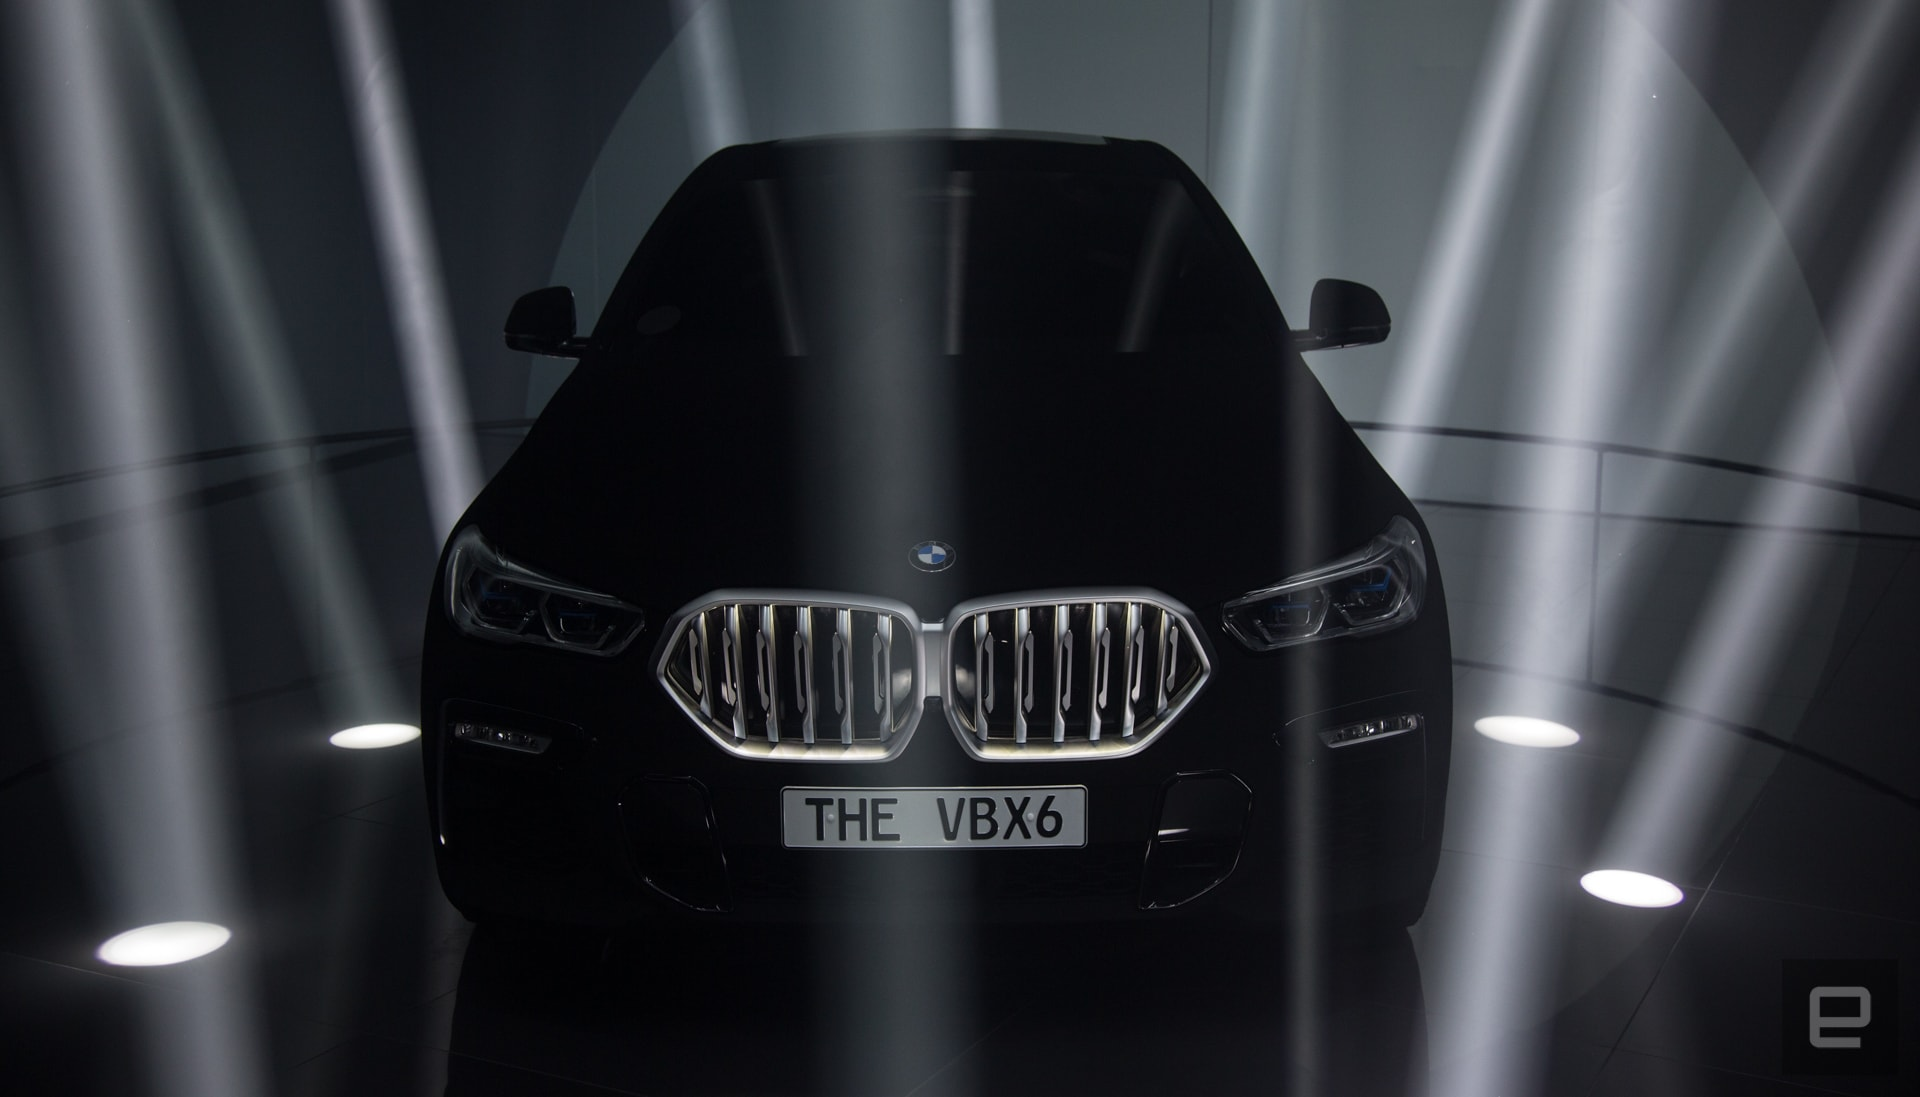 Even BMW's 'Vantablack' X6 gets caught by LiDAR